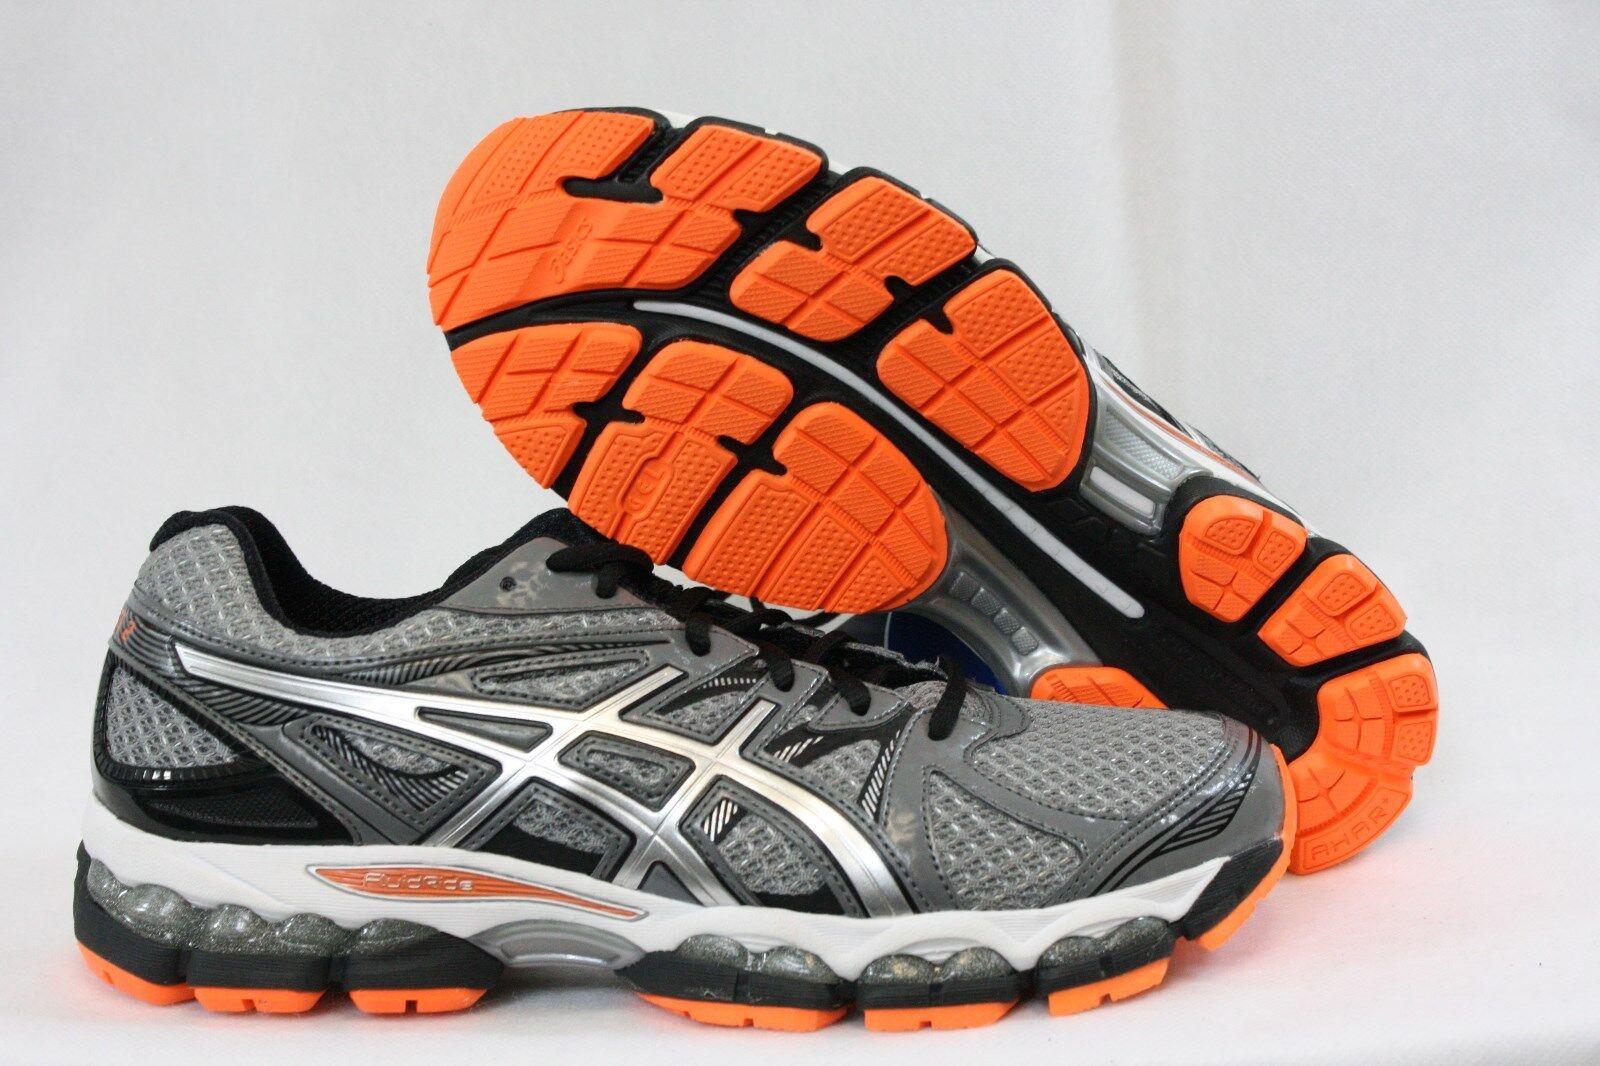 Nuova Uomo asic gel evate 2 t4a2q scarpe, 7591 silver nero arancione scarpe, t4a2q scarpe 395bb8